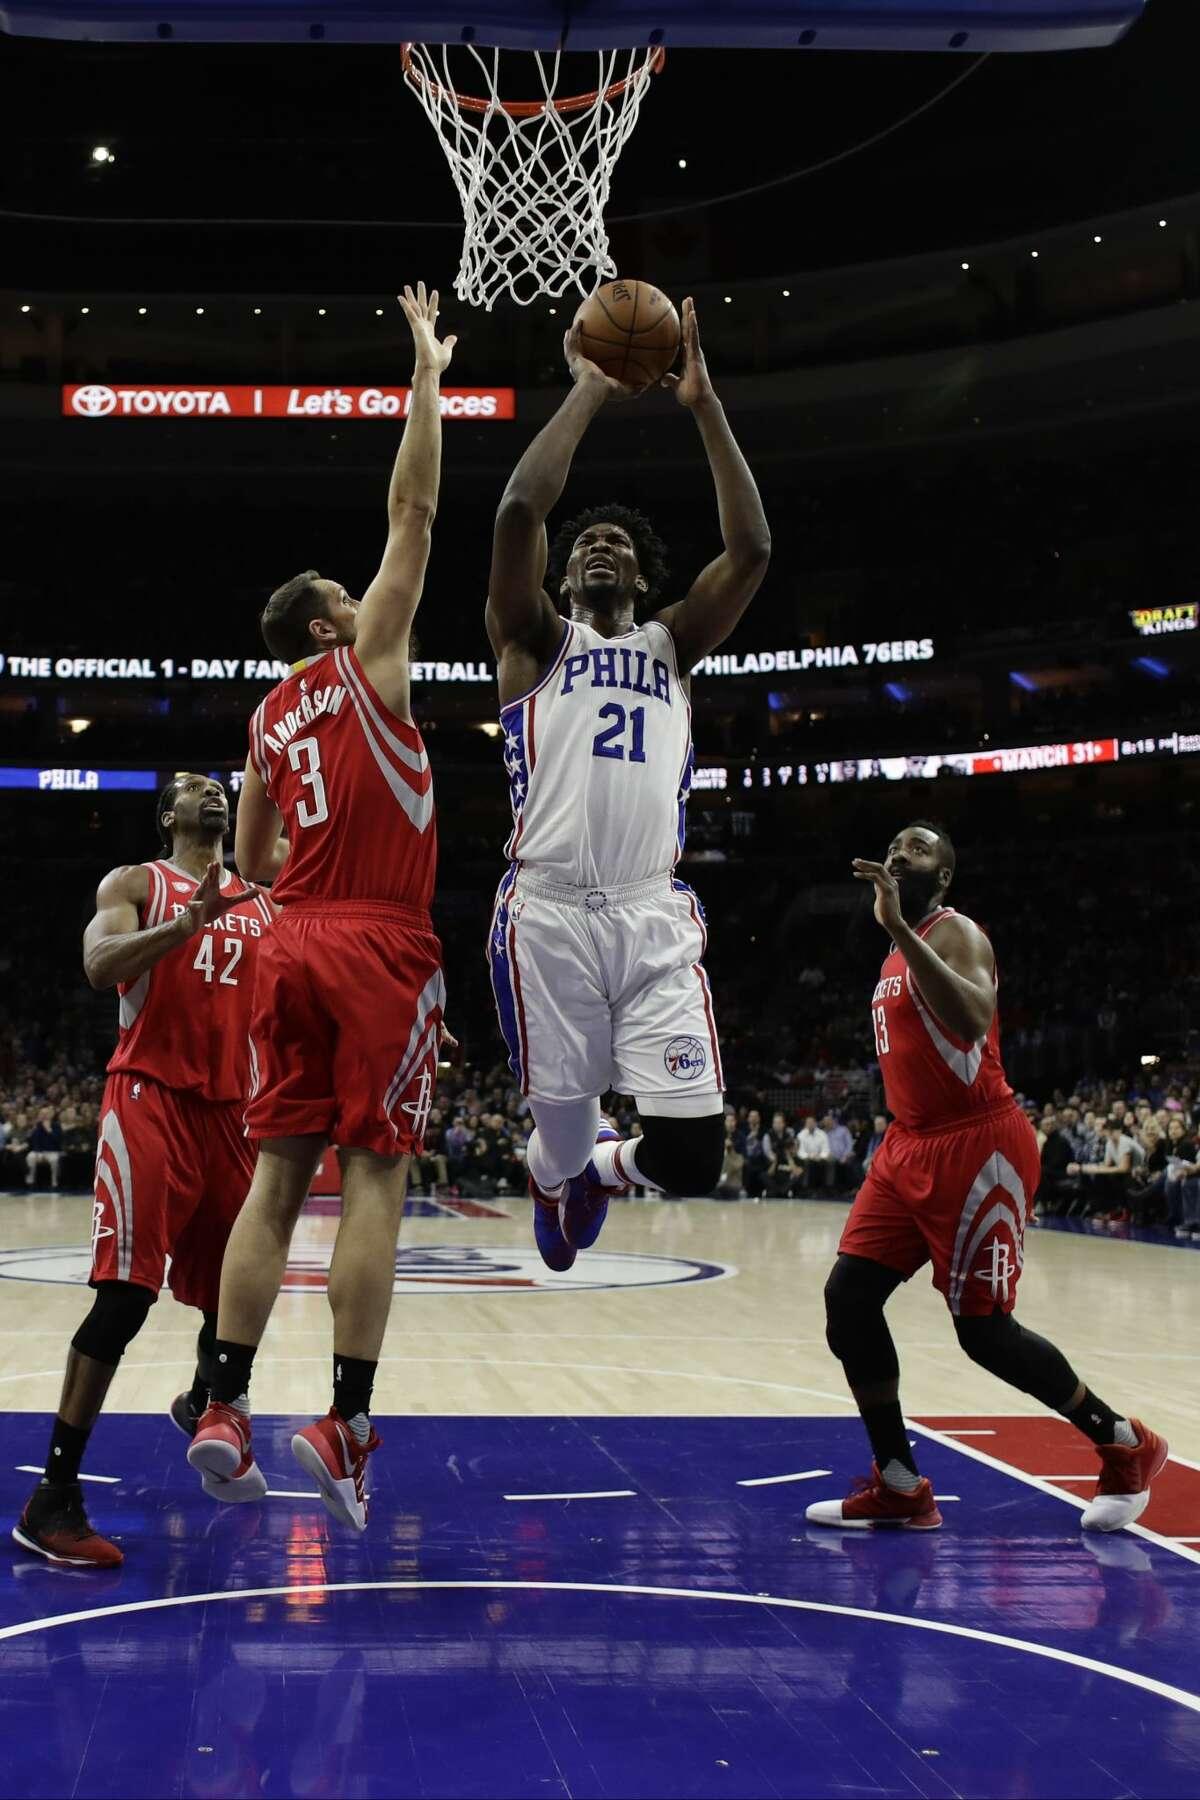 Philadelphia 76ers' Joel Embiid in action during an NBA basketball game against the Houston Rockets, Friday, Jan. 27, 2017, in Philadelphia. (AP Photo/Matt Slocum)